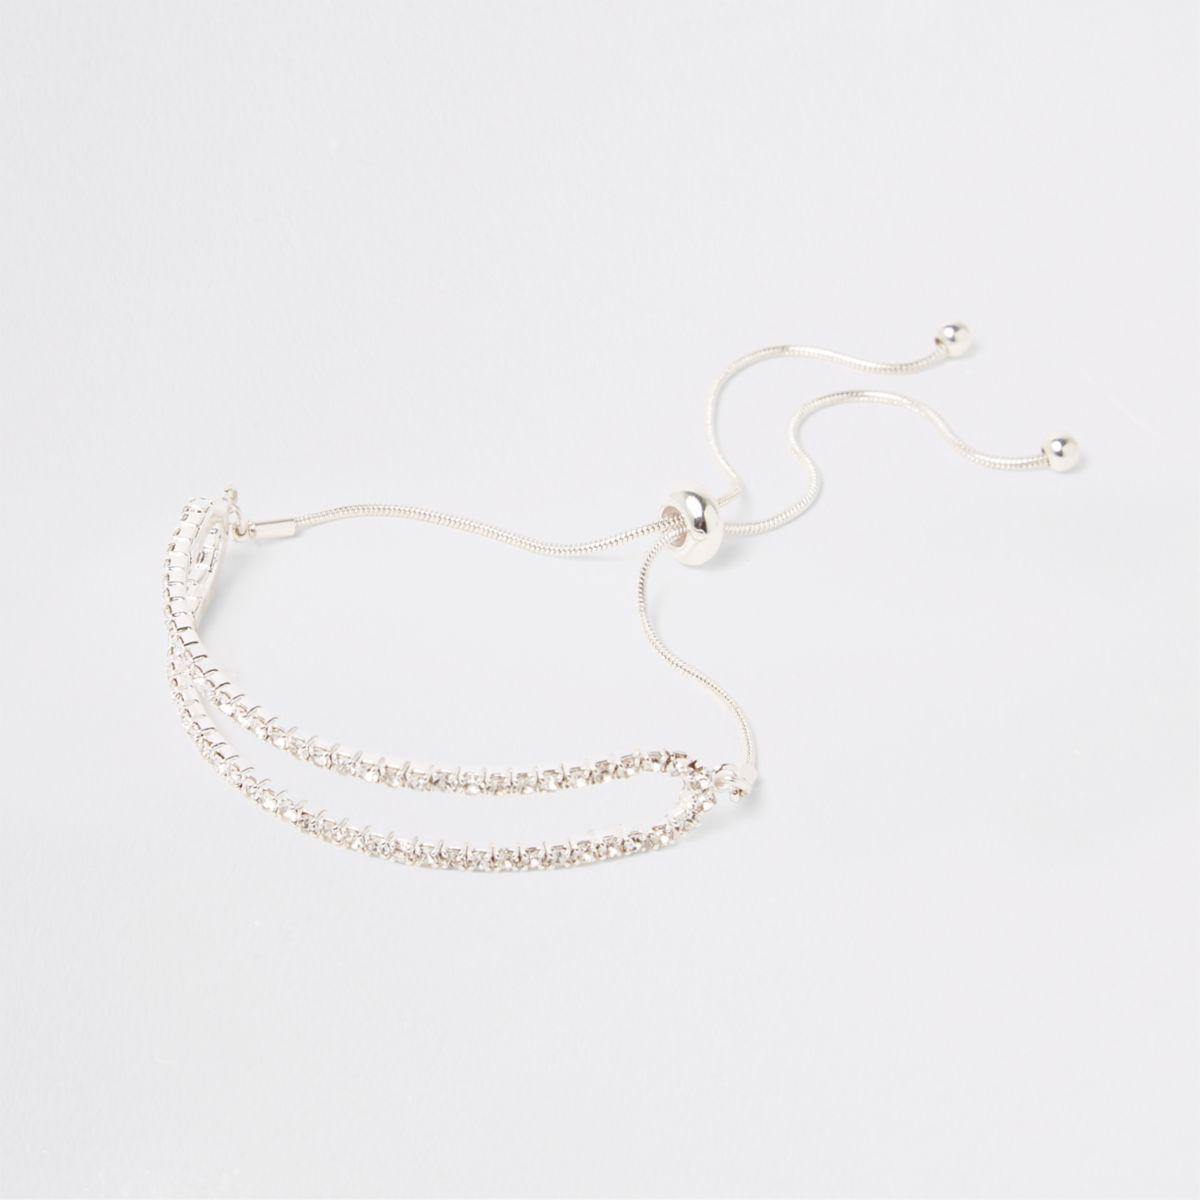 Silver tone double rhinestone lariat bracelet